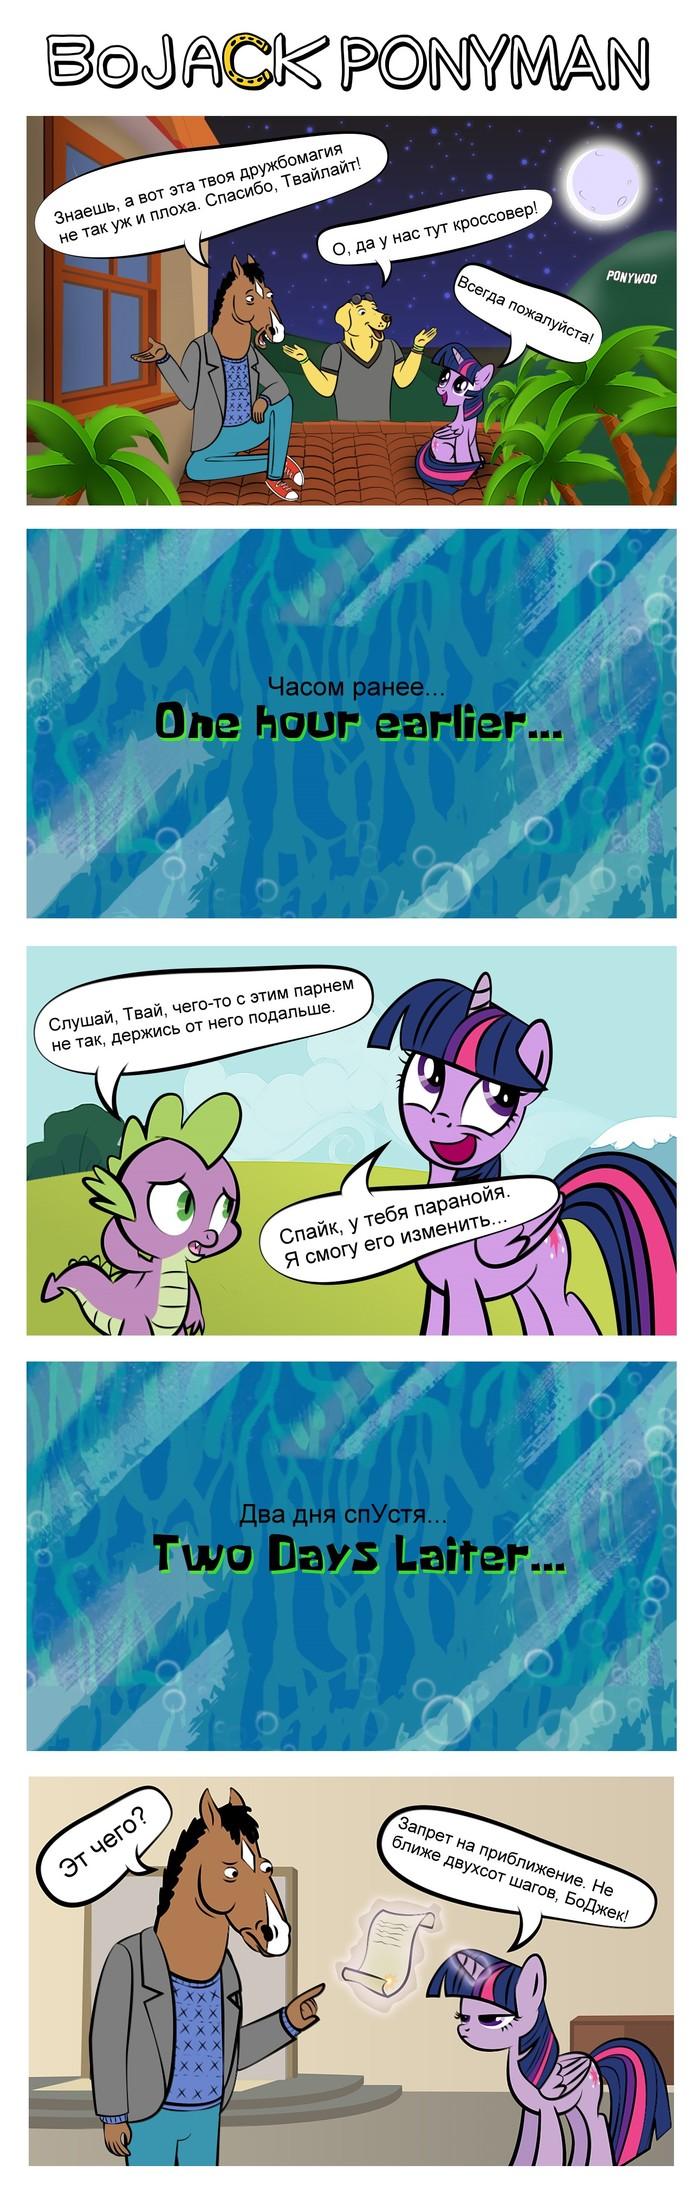 Он не виноват My little pony, Twilight Sparkle, Spike, Bojack Horseman, Конь Боджек, Mlp crossover, Длиннопост